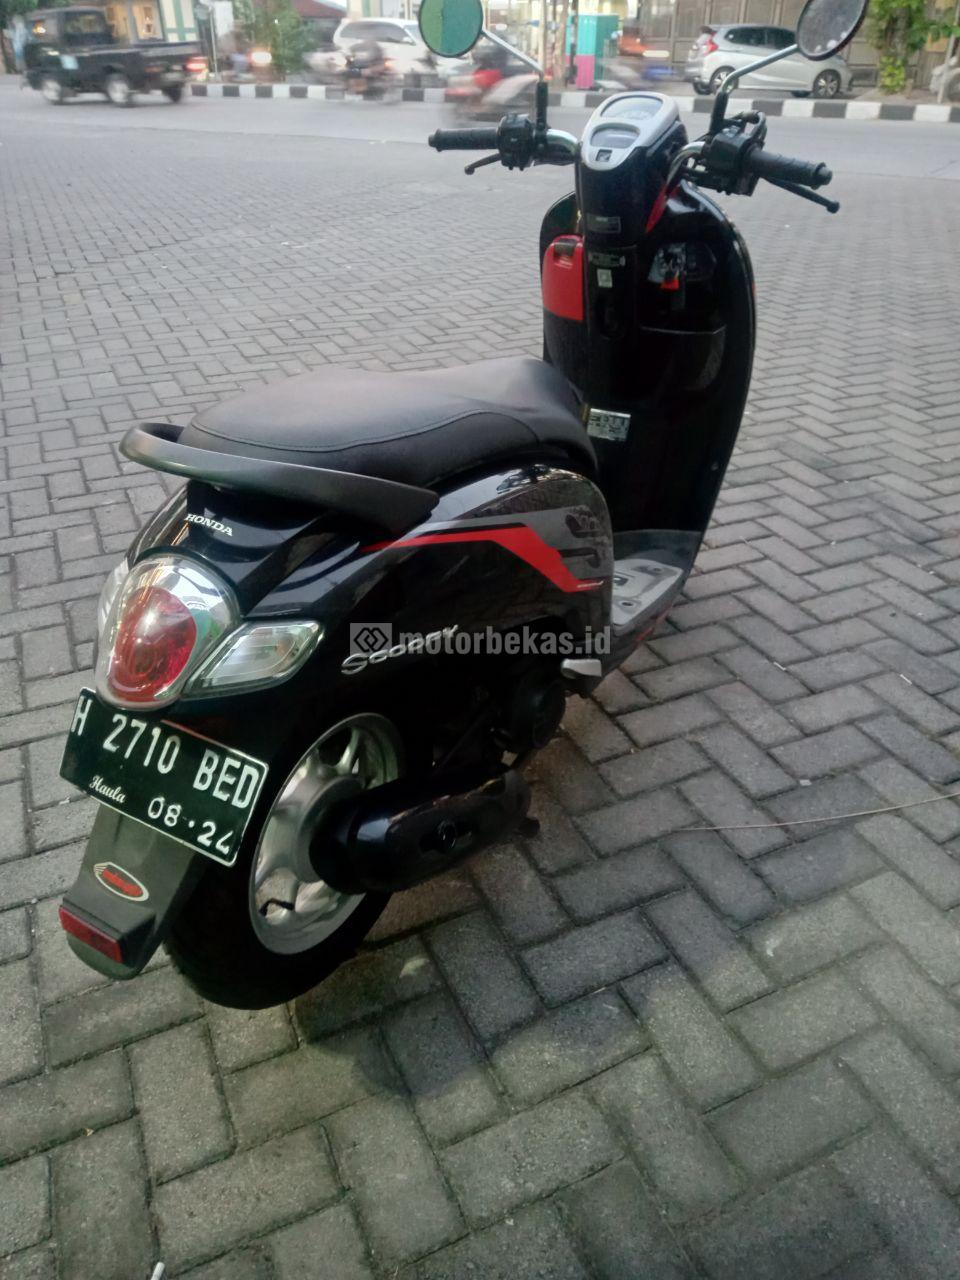 HONDA SCOOPY FI 2204 motorbekas.id